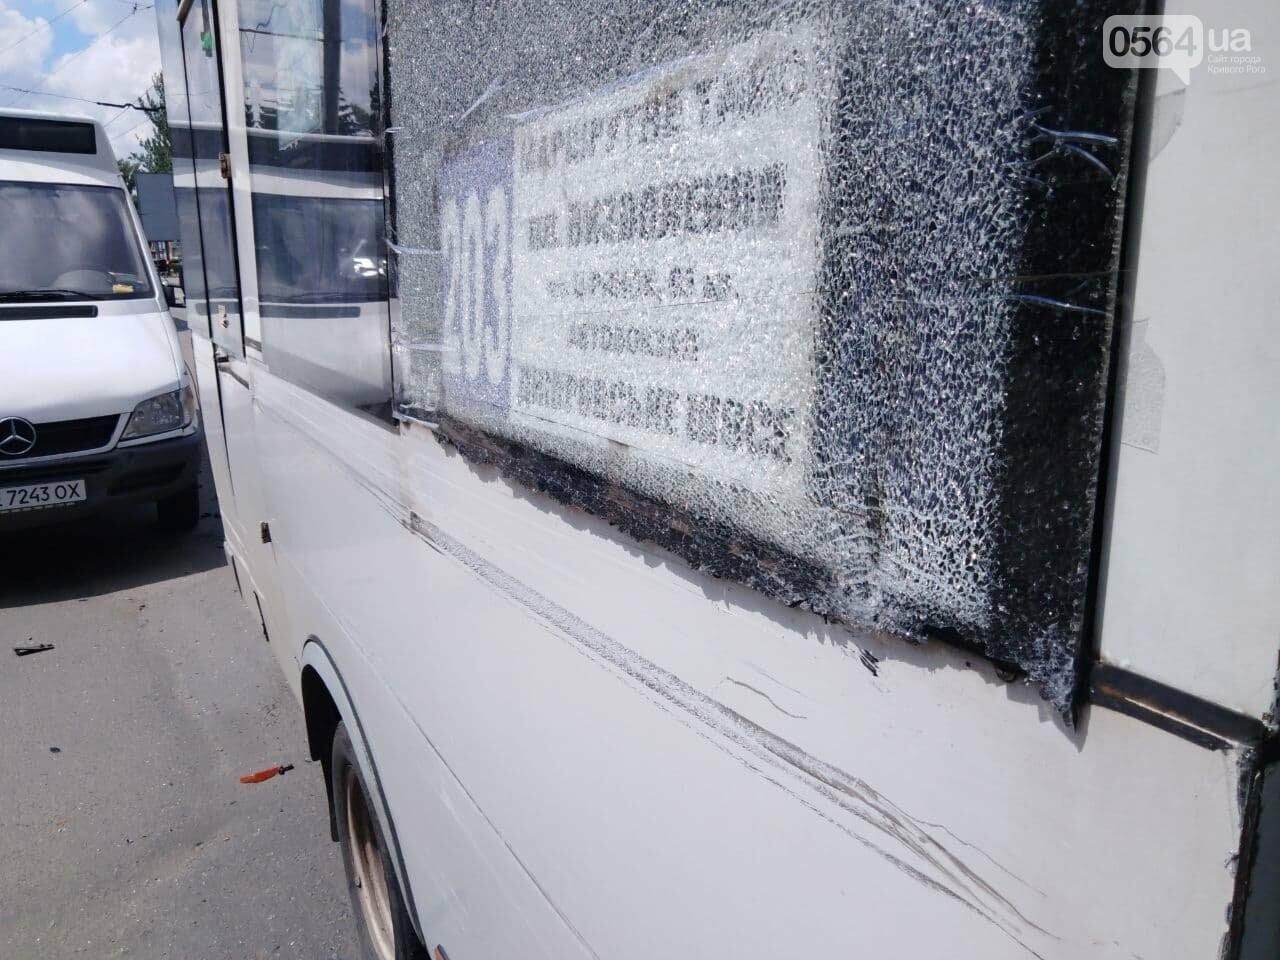 В Кривом Роге столкнулись две маршрутки, - ФОТО, фото-9